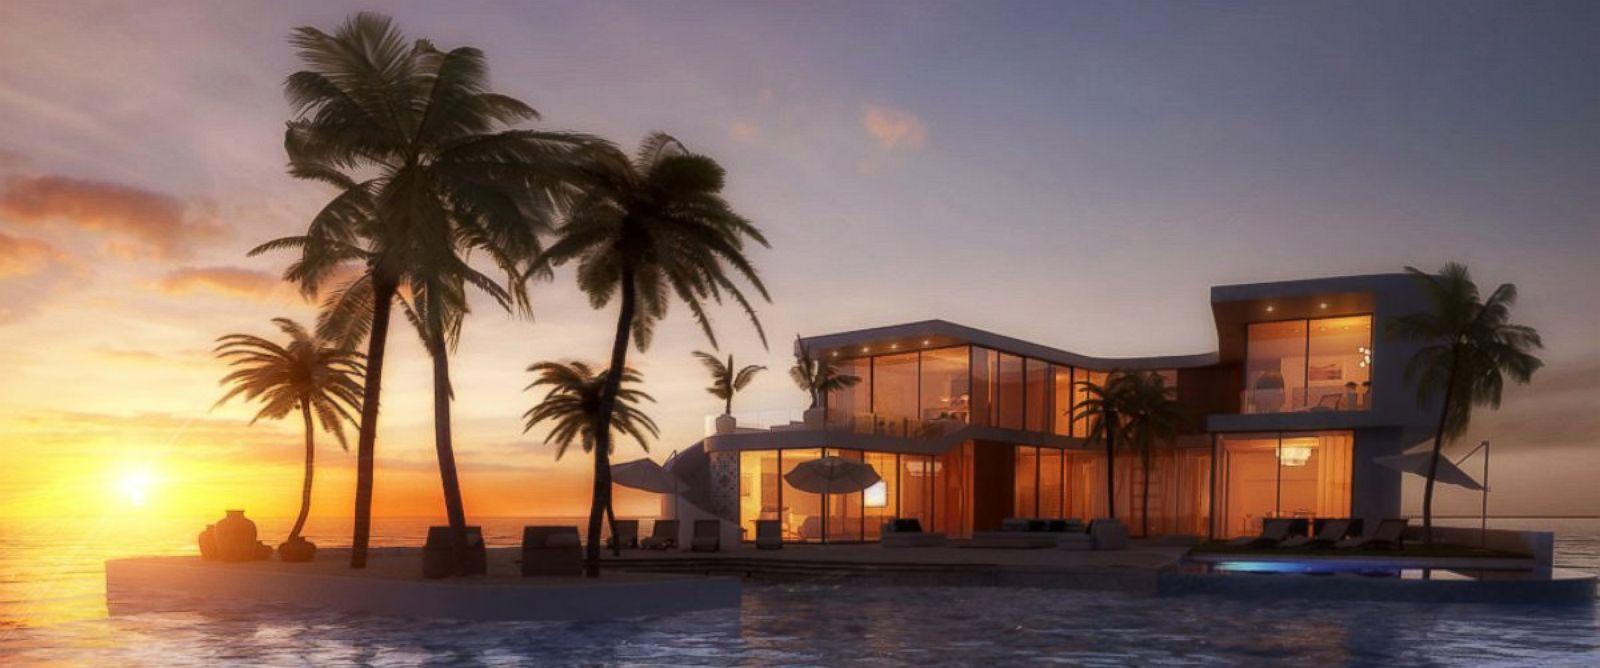 Luxury Real Estate Developer Creates Floating Private